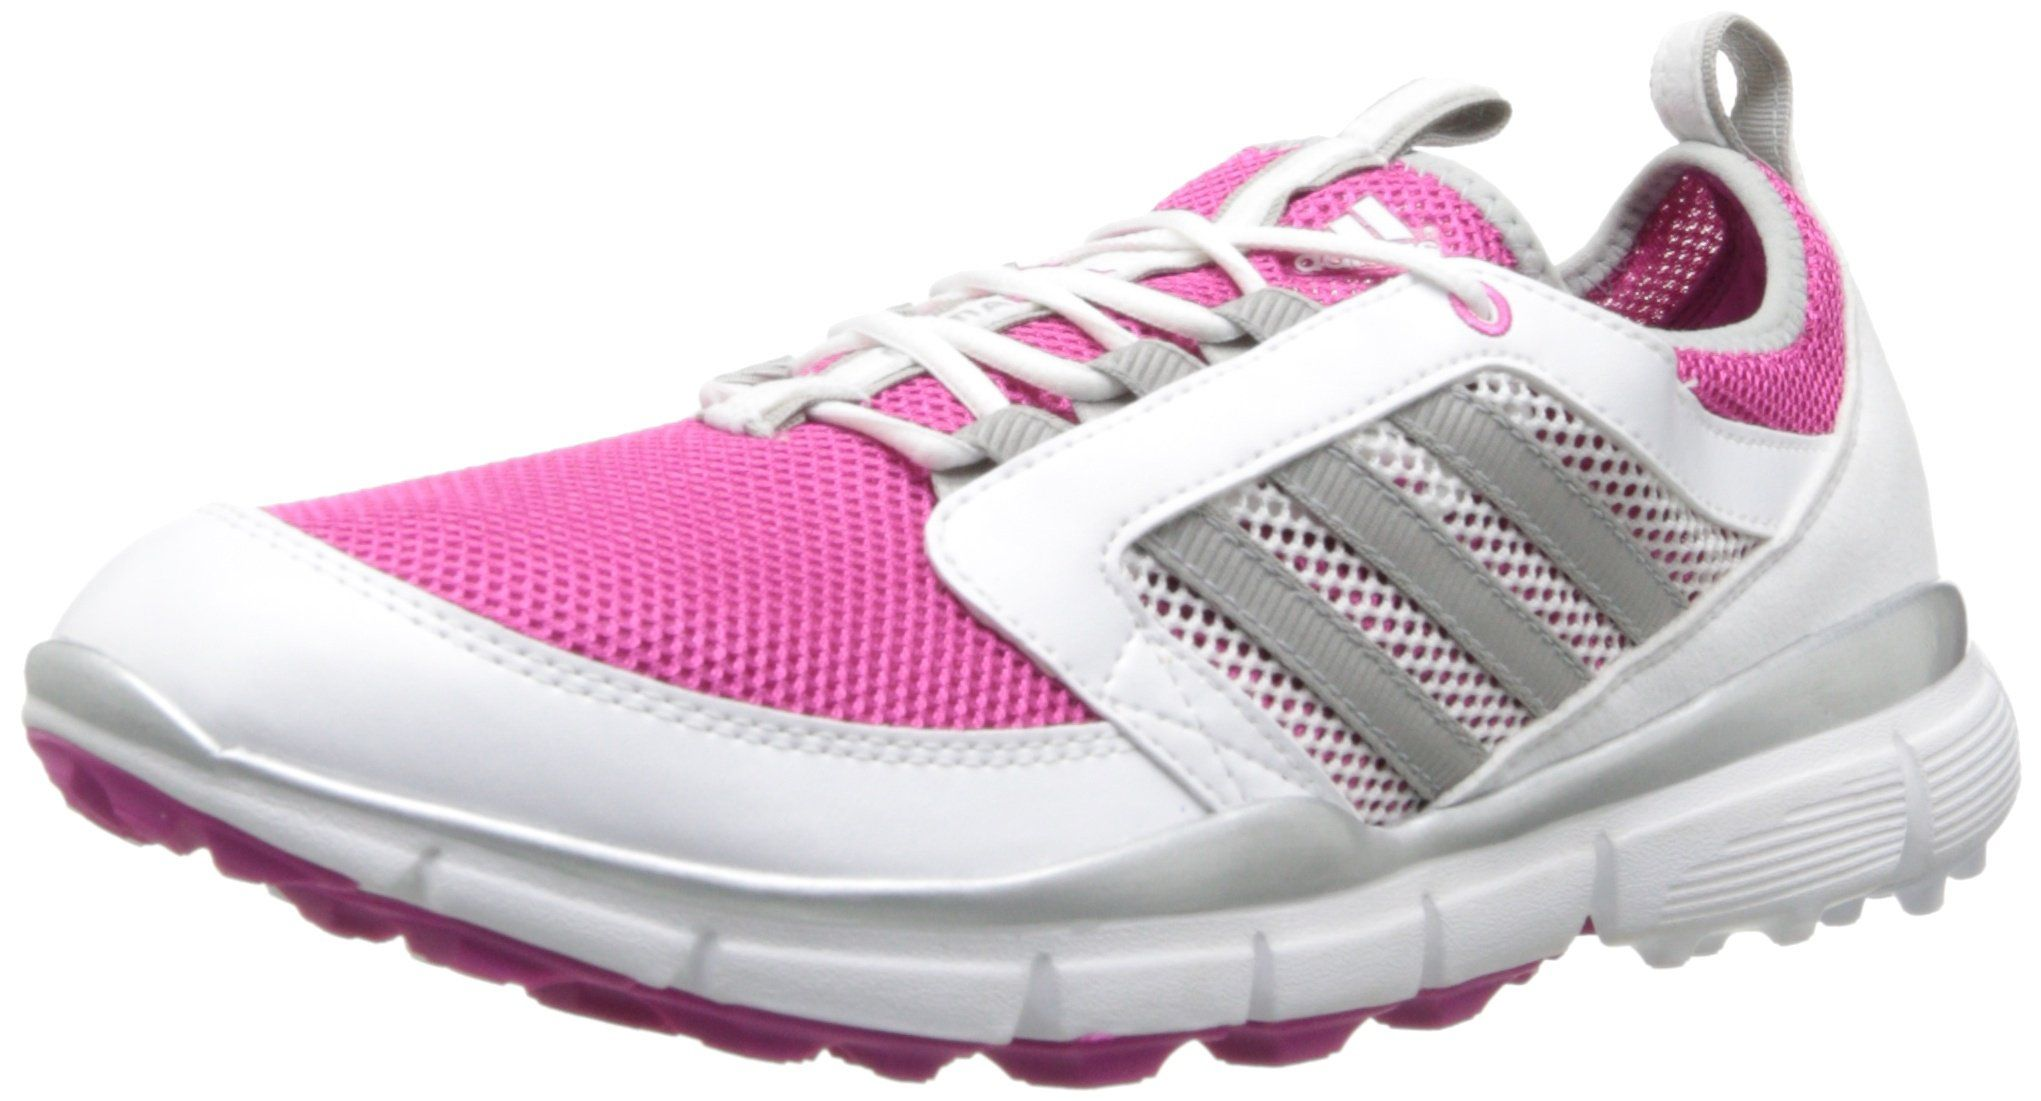 adidas Women's Adistar Climacool Golf Shoe,Bahia Magenta/Metallic Silver/ White,6